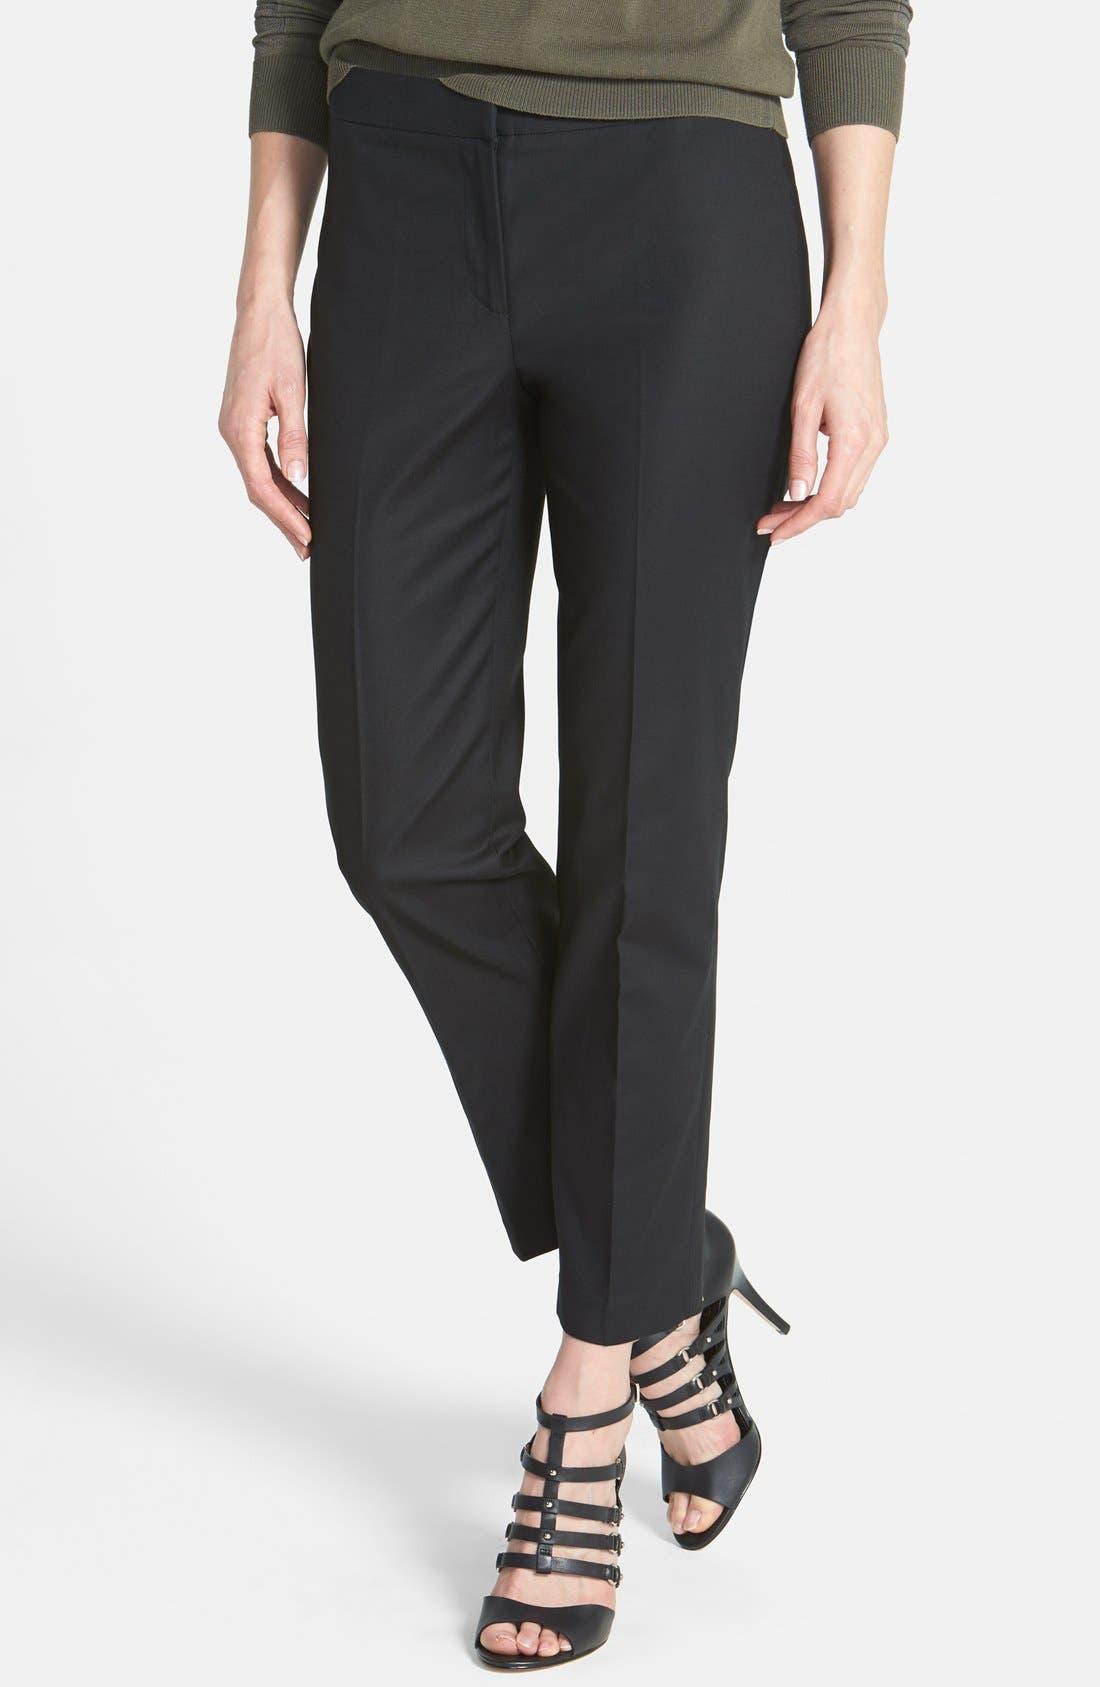 Main Image - NIC+ZOE The Perfect Ankle Pants (Regular & Petite)